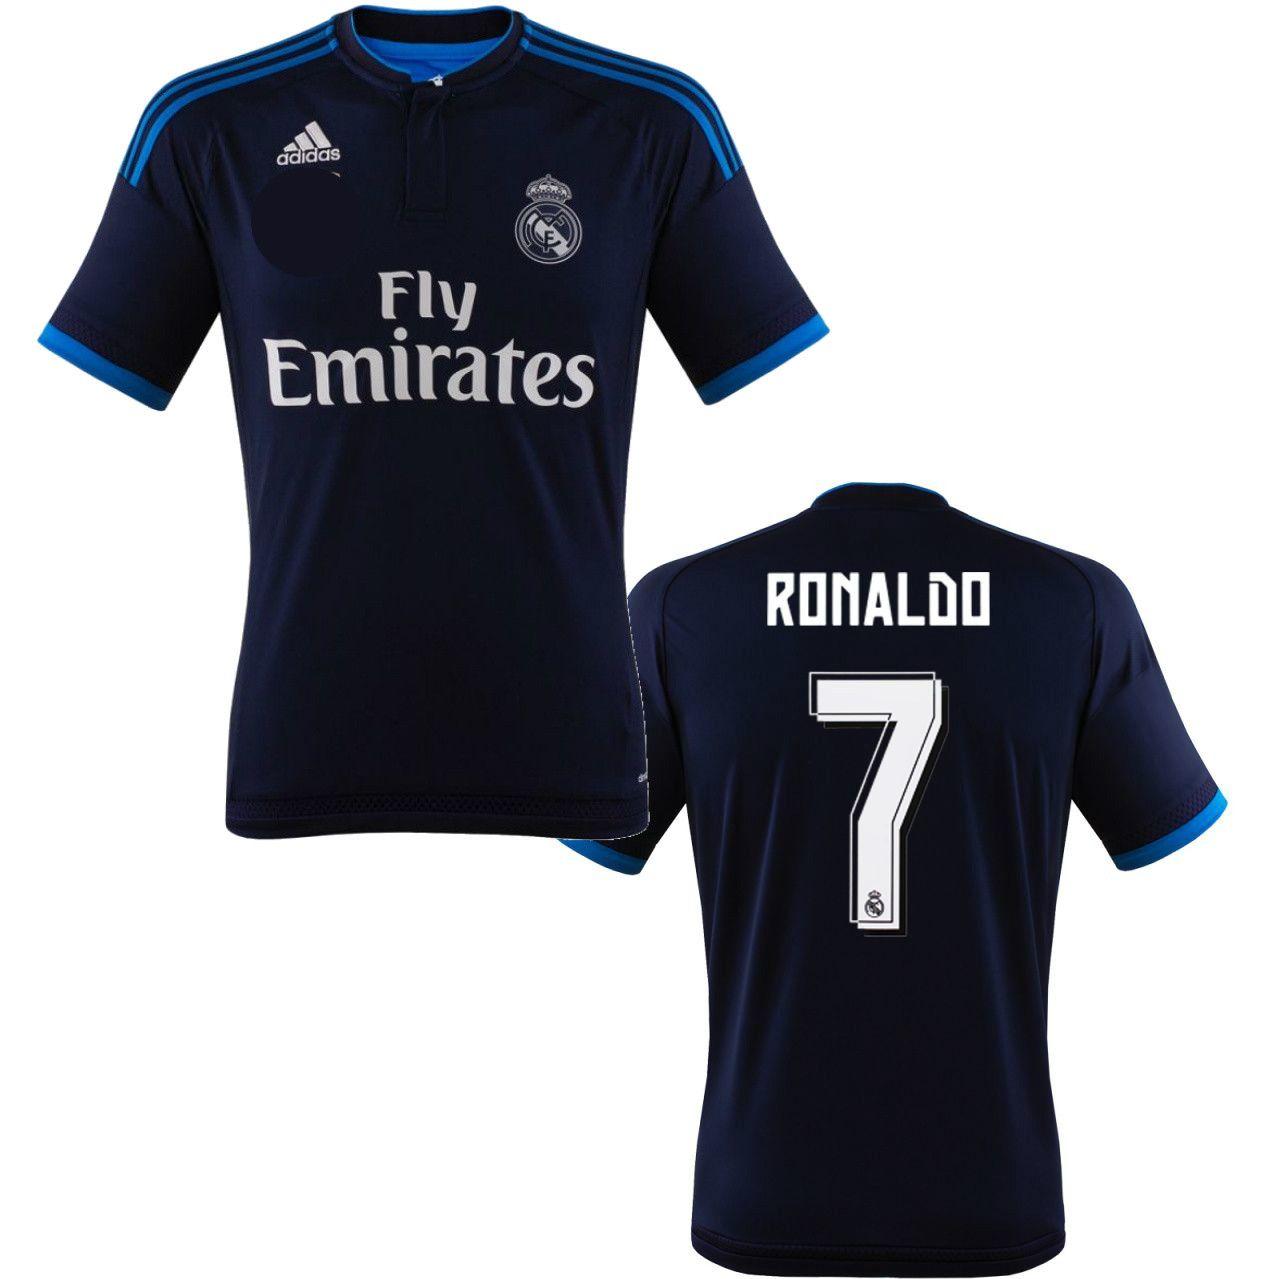 sports shoes 74f47 751f7 Ronaldo Jersey Real Madrid 2015 2016 | Cristiano Ronaldo ...